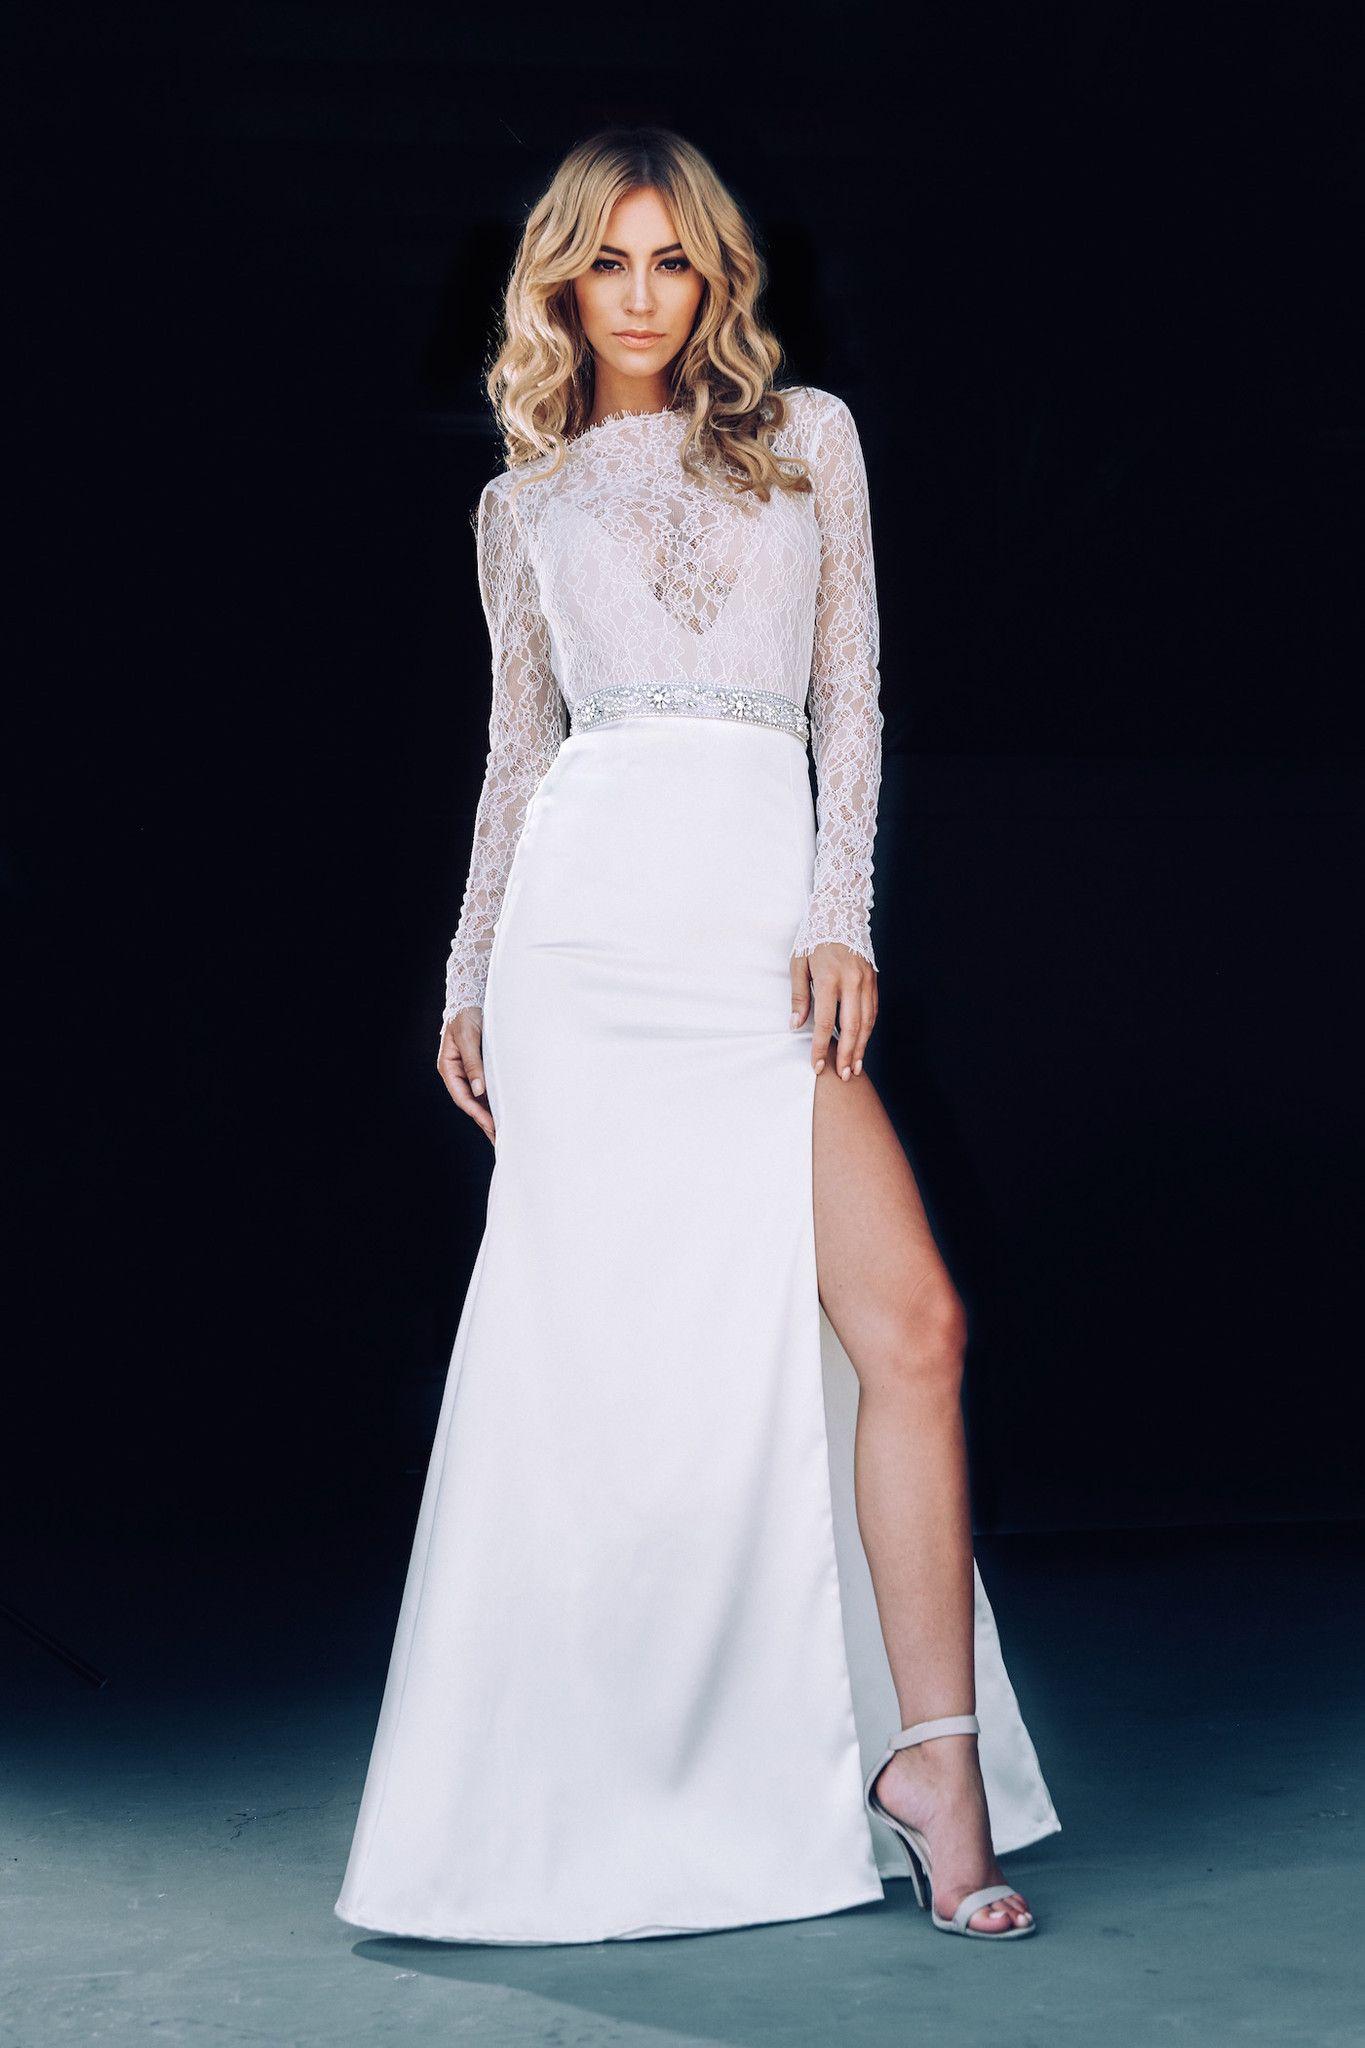 long sleeves wedding dress - Lurelly Bridal Wedding Dress | fabmood.com